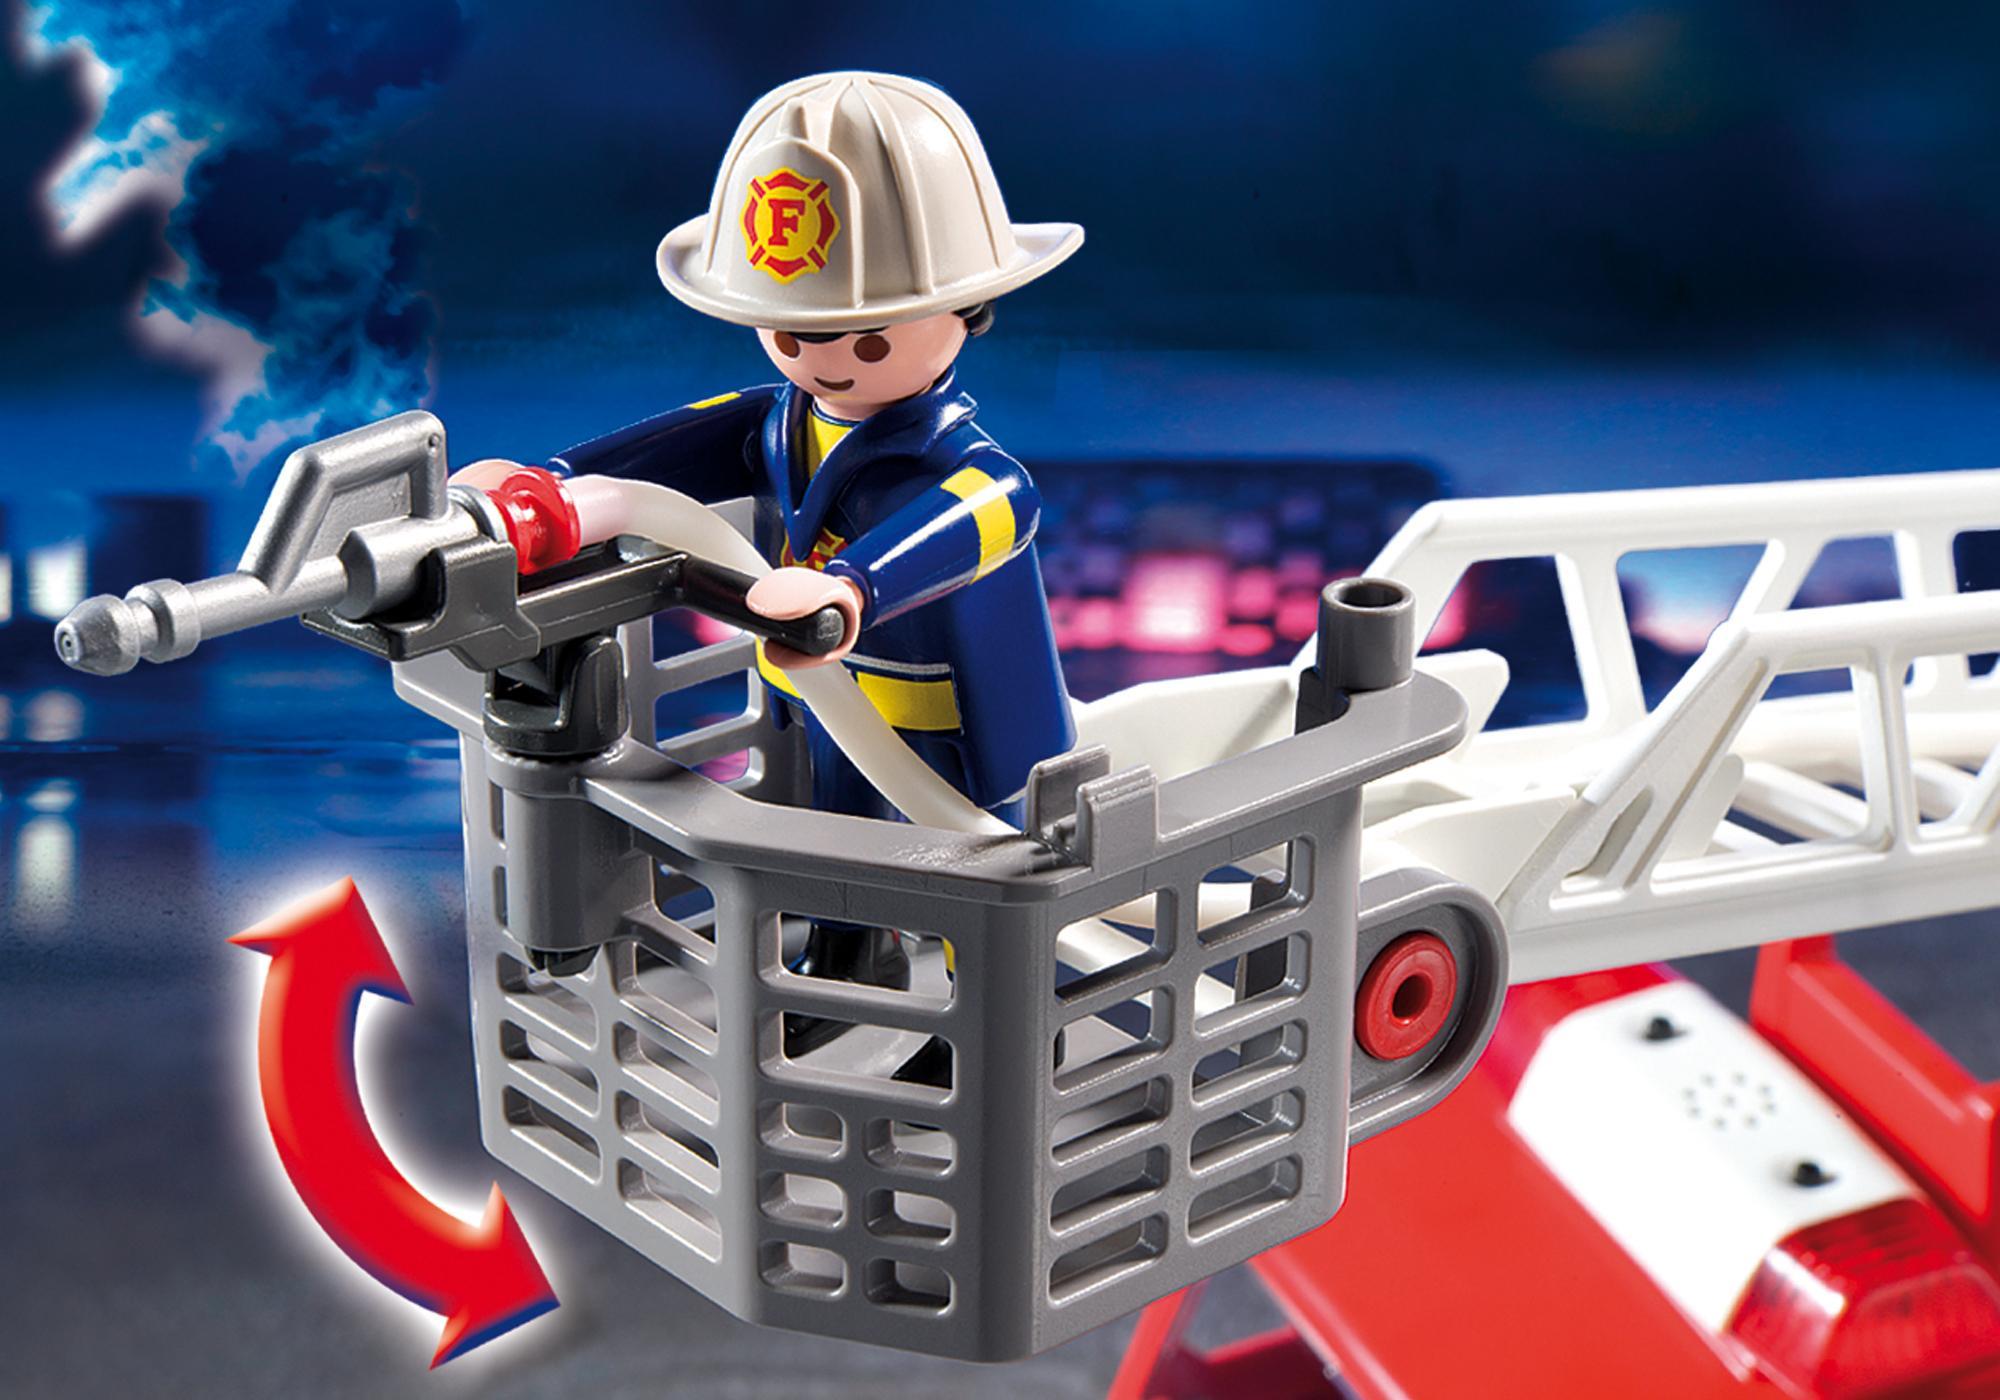 http://media.playmobil.com/i/playmobil/5682_product_extra2/Rescue Ladder Unit